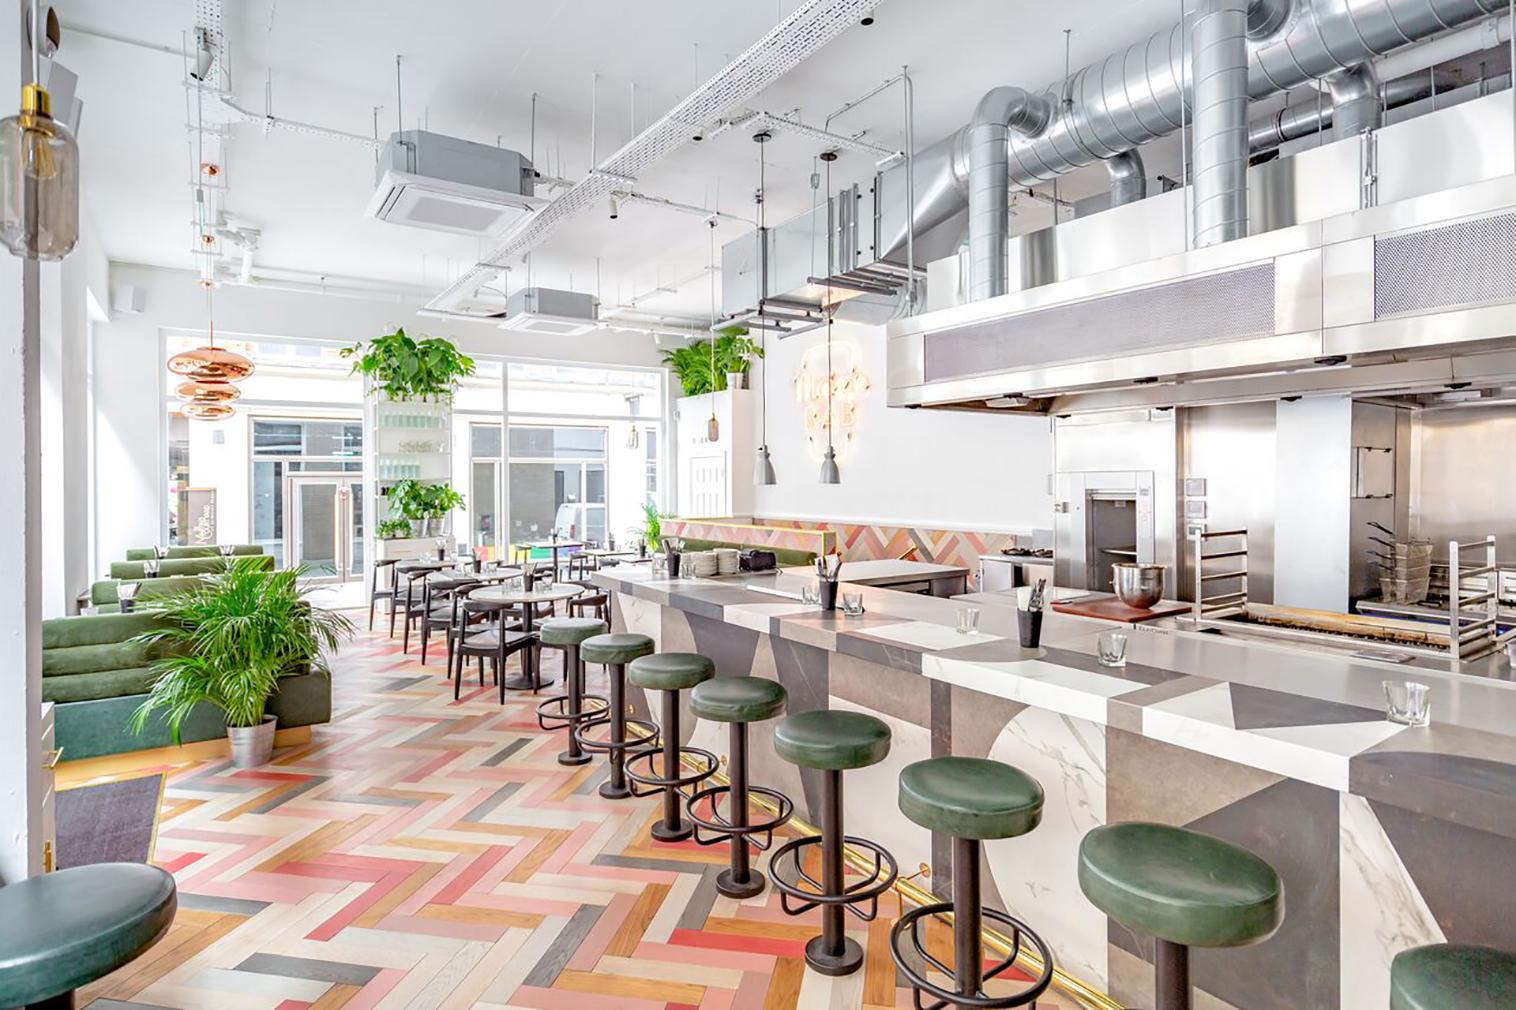 New London restaurants to visit this autumn